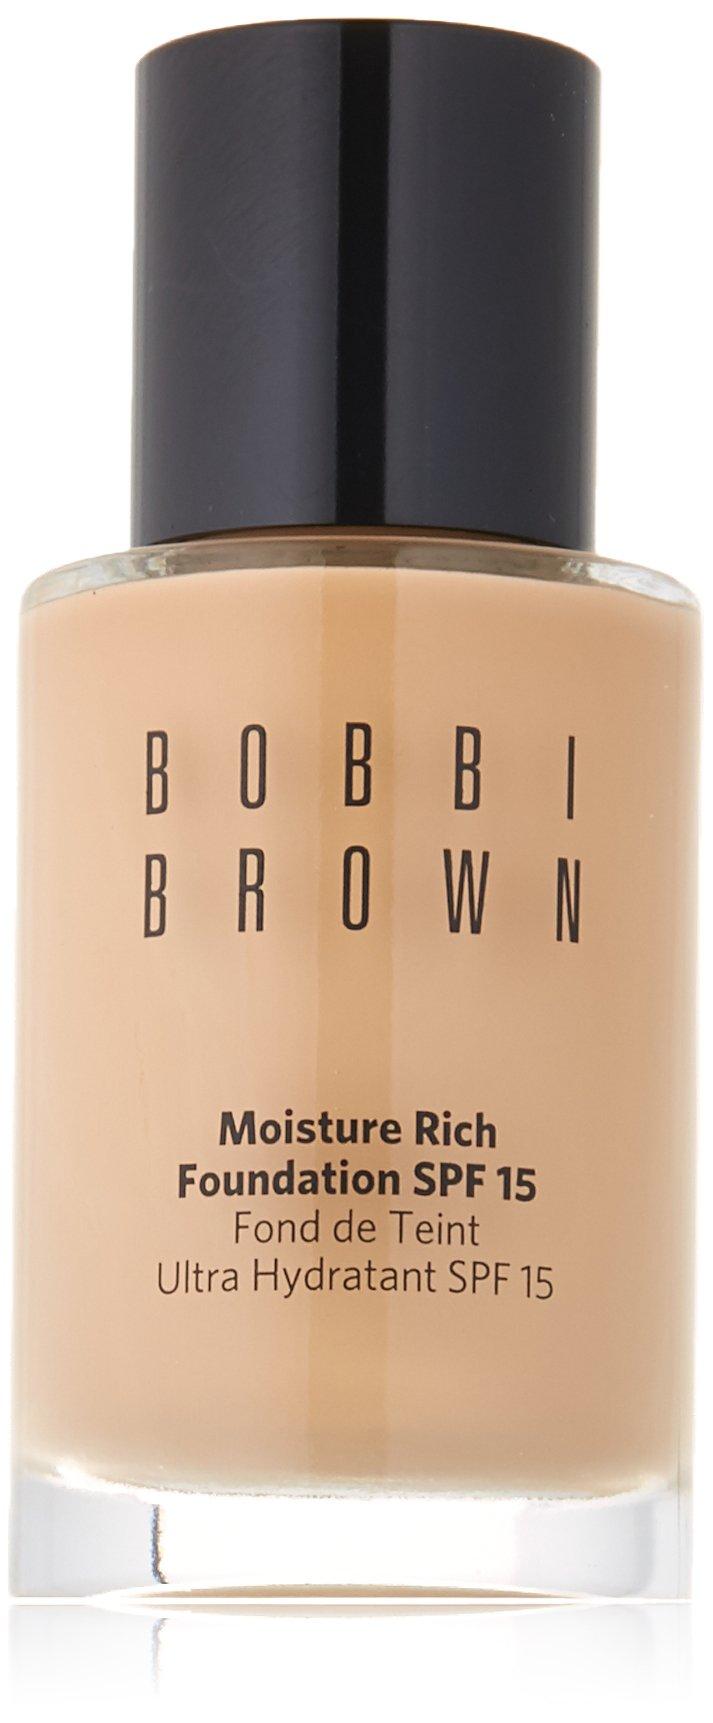 Bobbi Brown Moisture Rich Foundation SPF15, No. 3 Beige, 1 Ounce